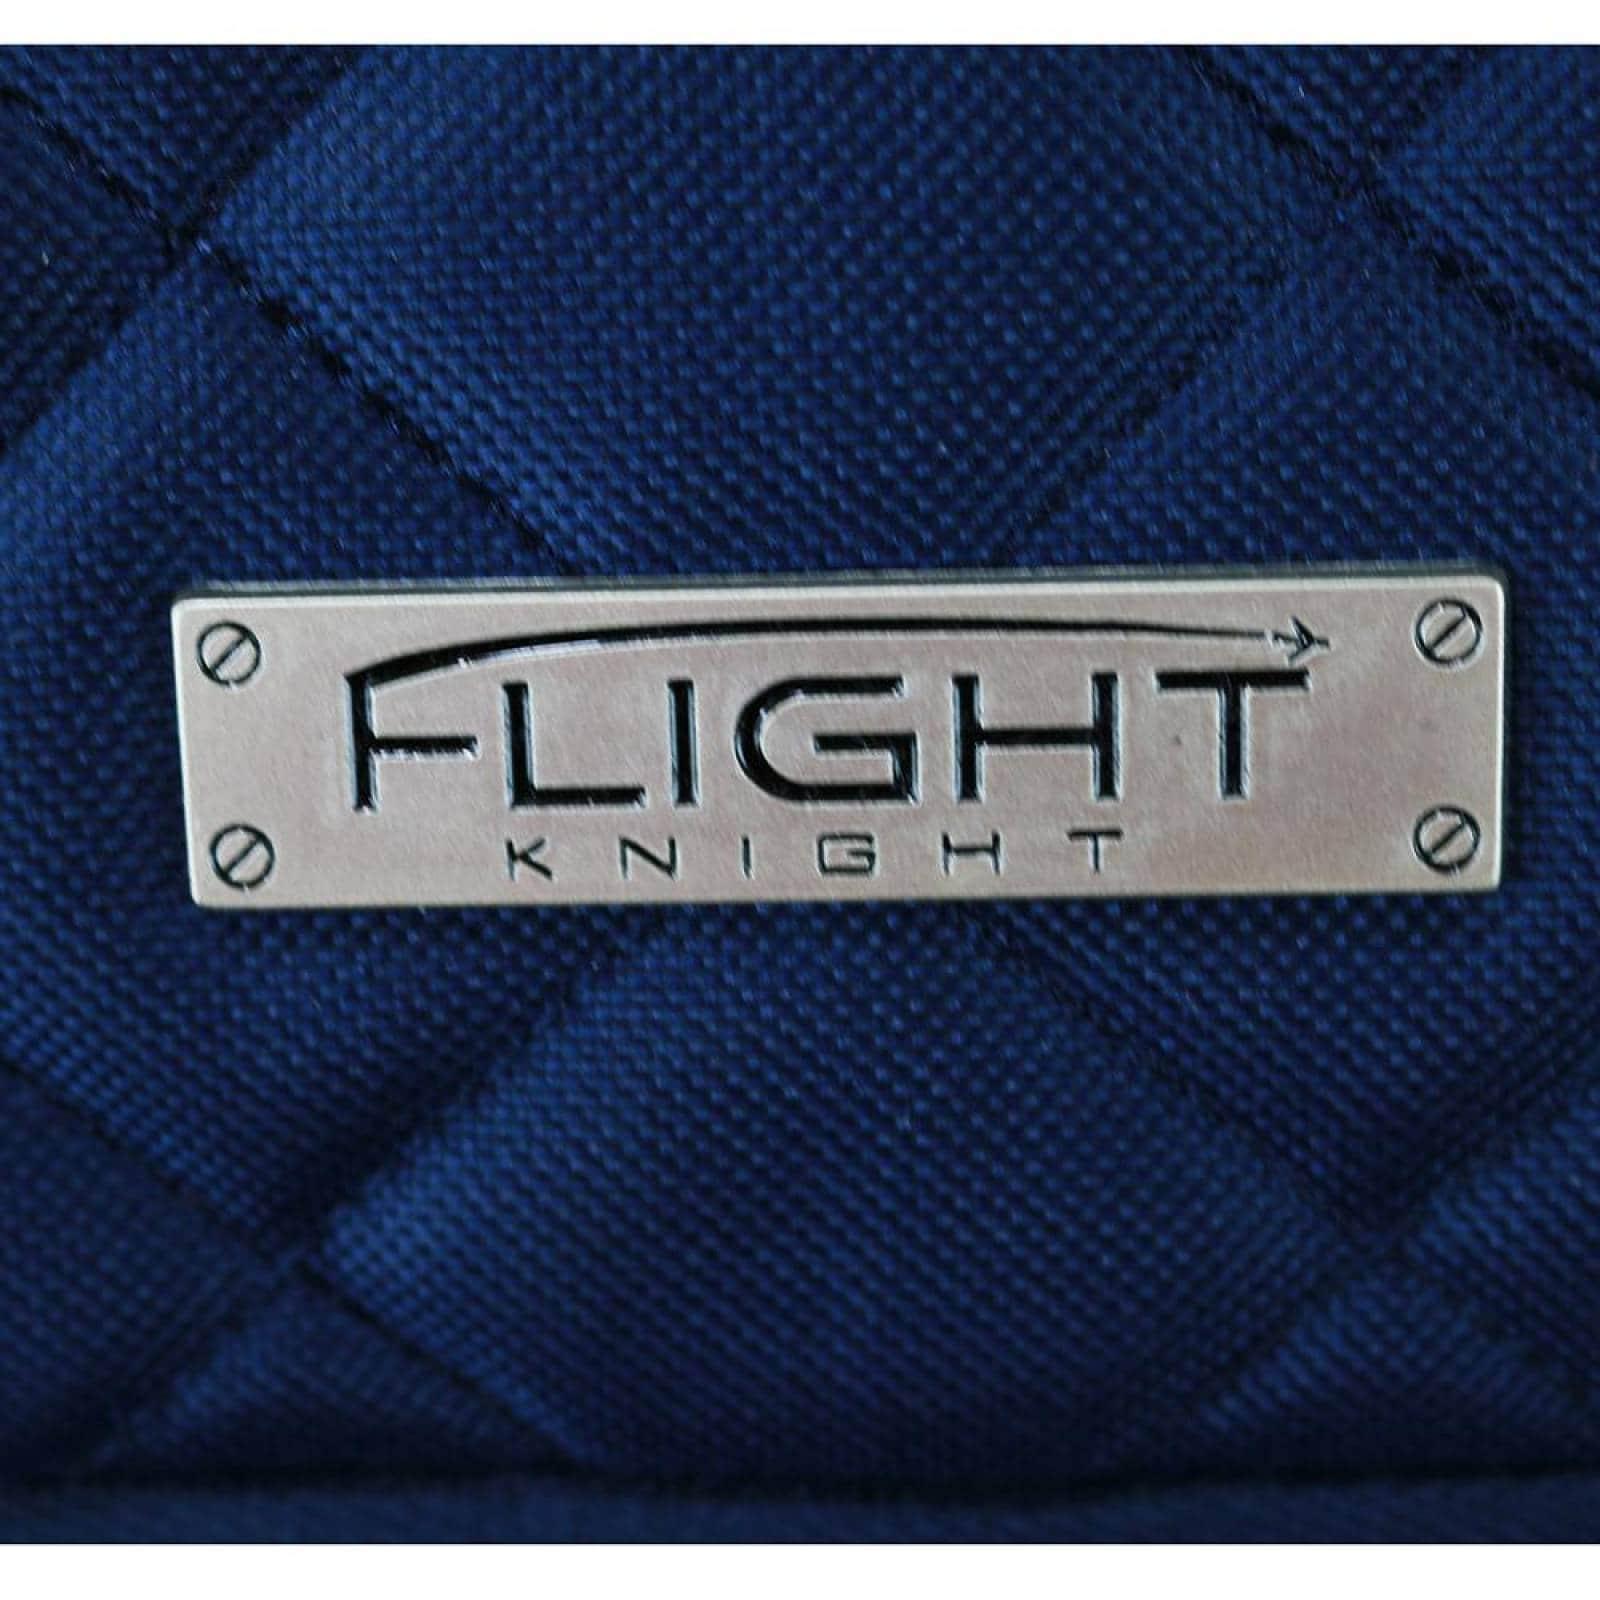 Maleta de mano de 16 Plgadas Flight Knight 2 ruedas (CL) Azul